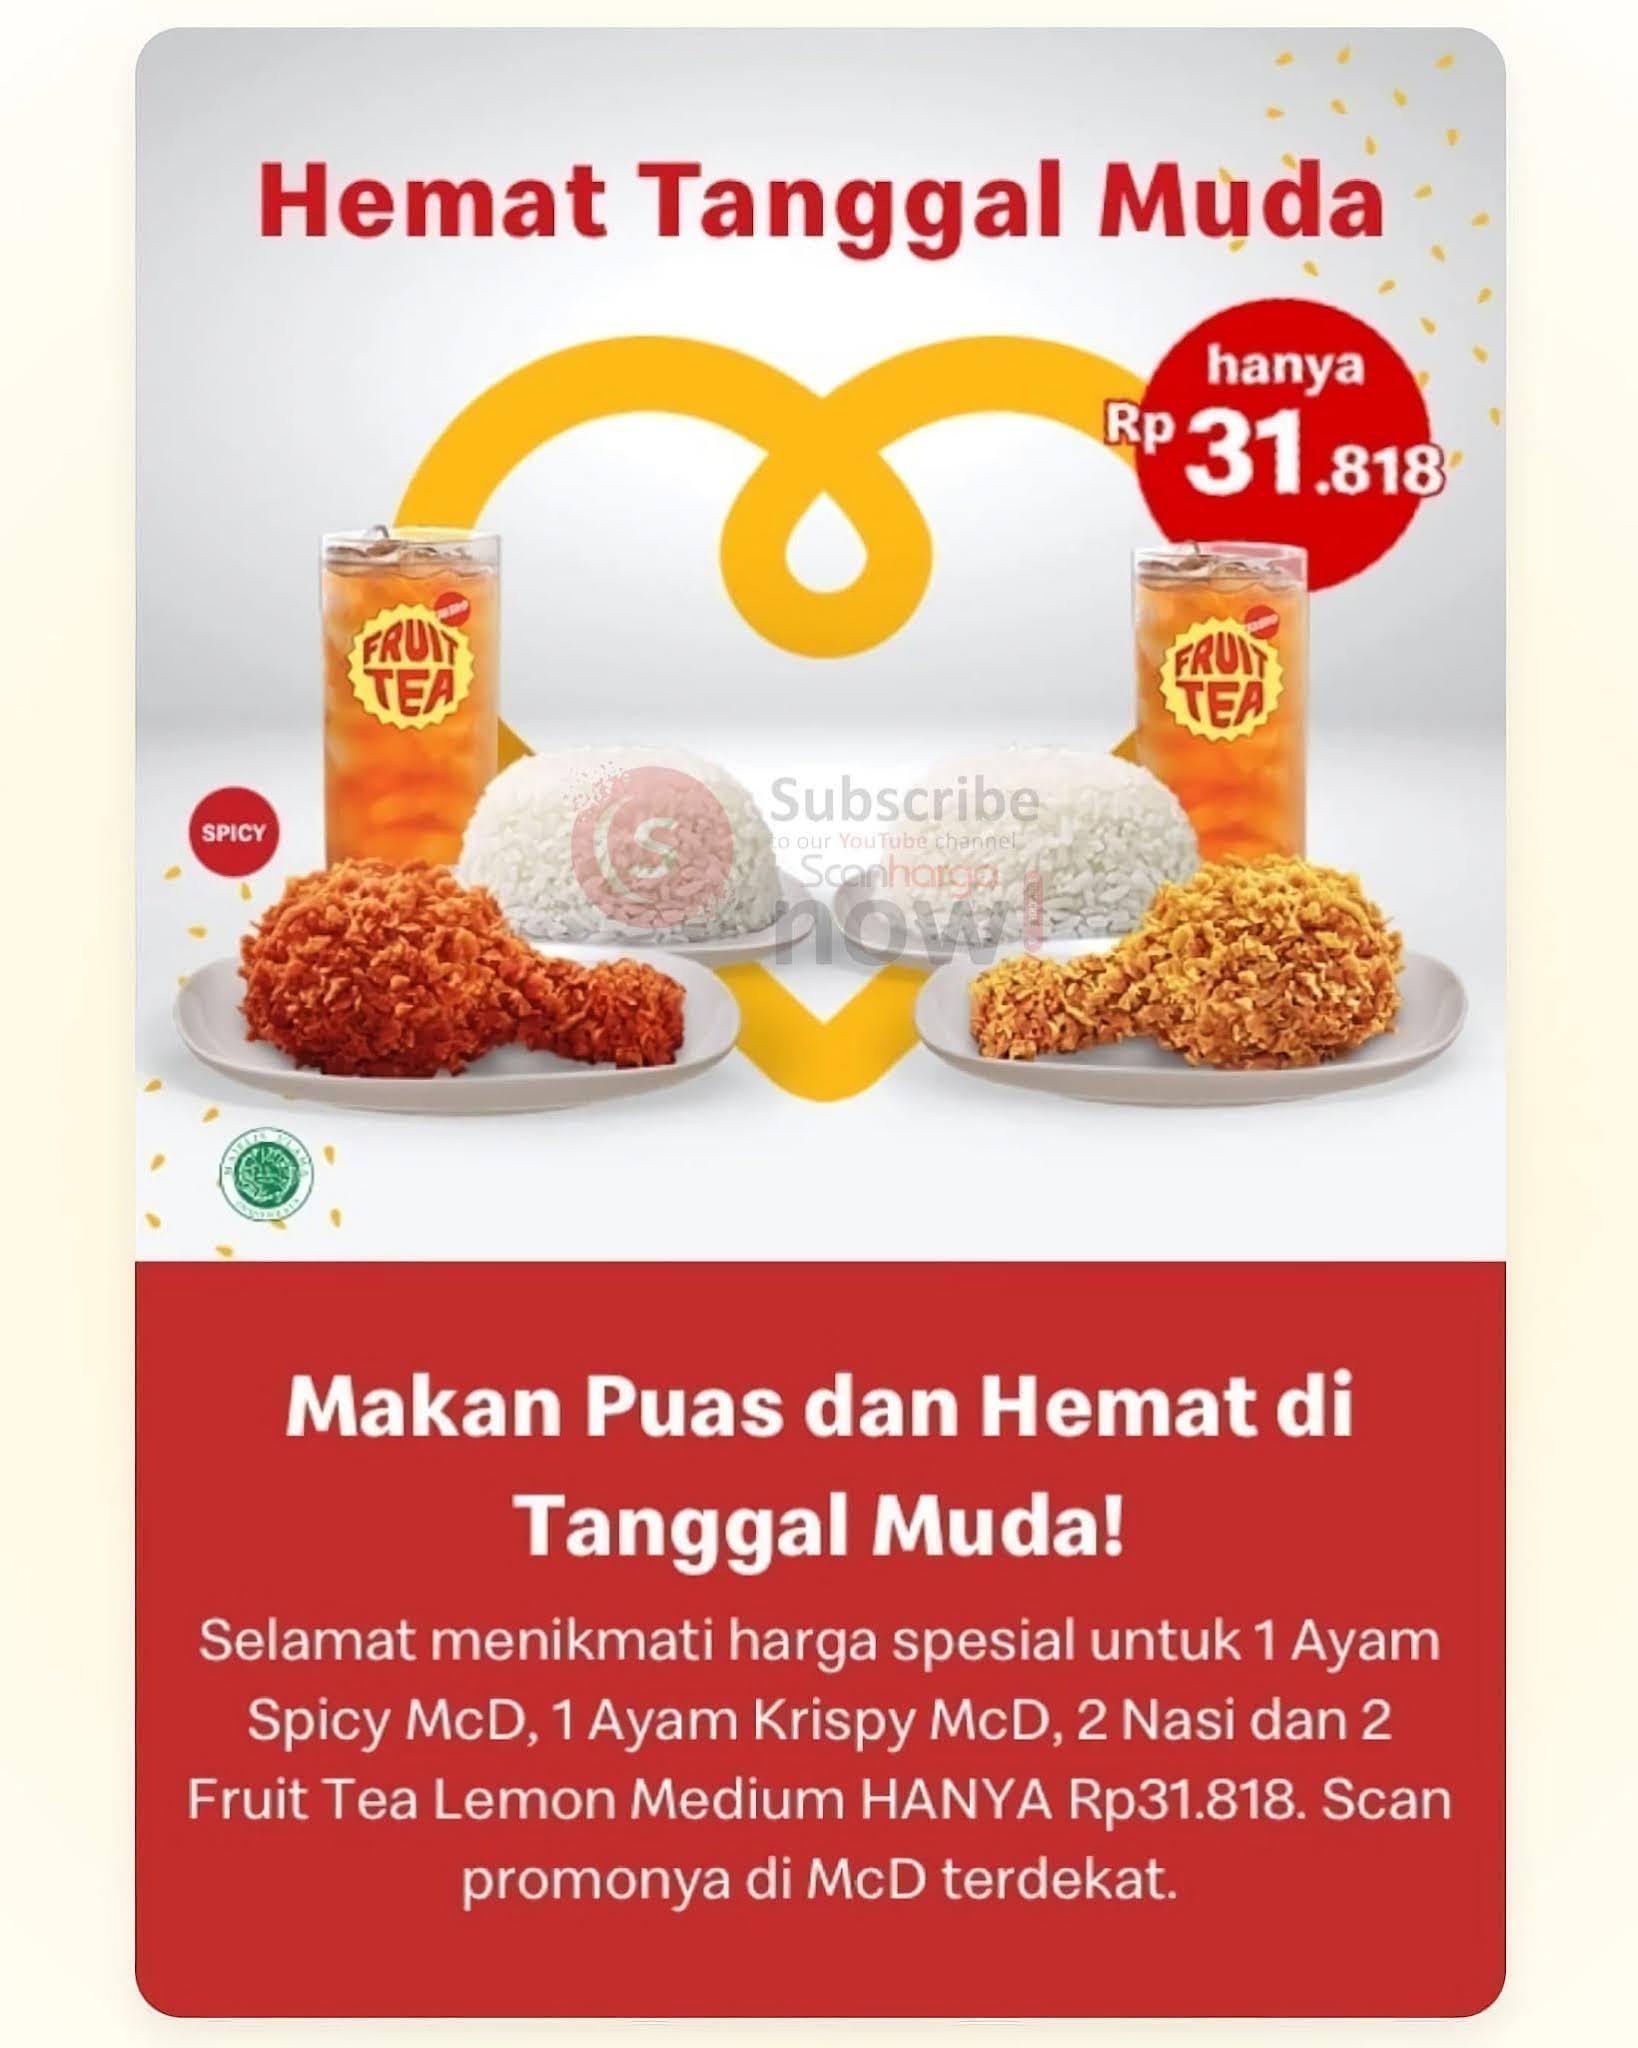 McDonald's Promo Hemat Tanggal Muda( 2 Ayam + 2 Nasi + 2 Fruit Tea Lemon) harga cuma Rp. 31.818